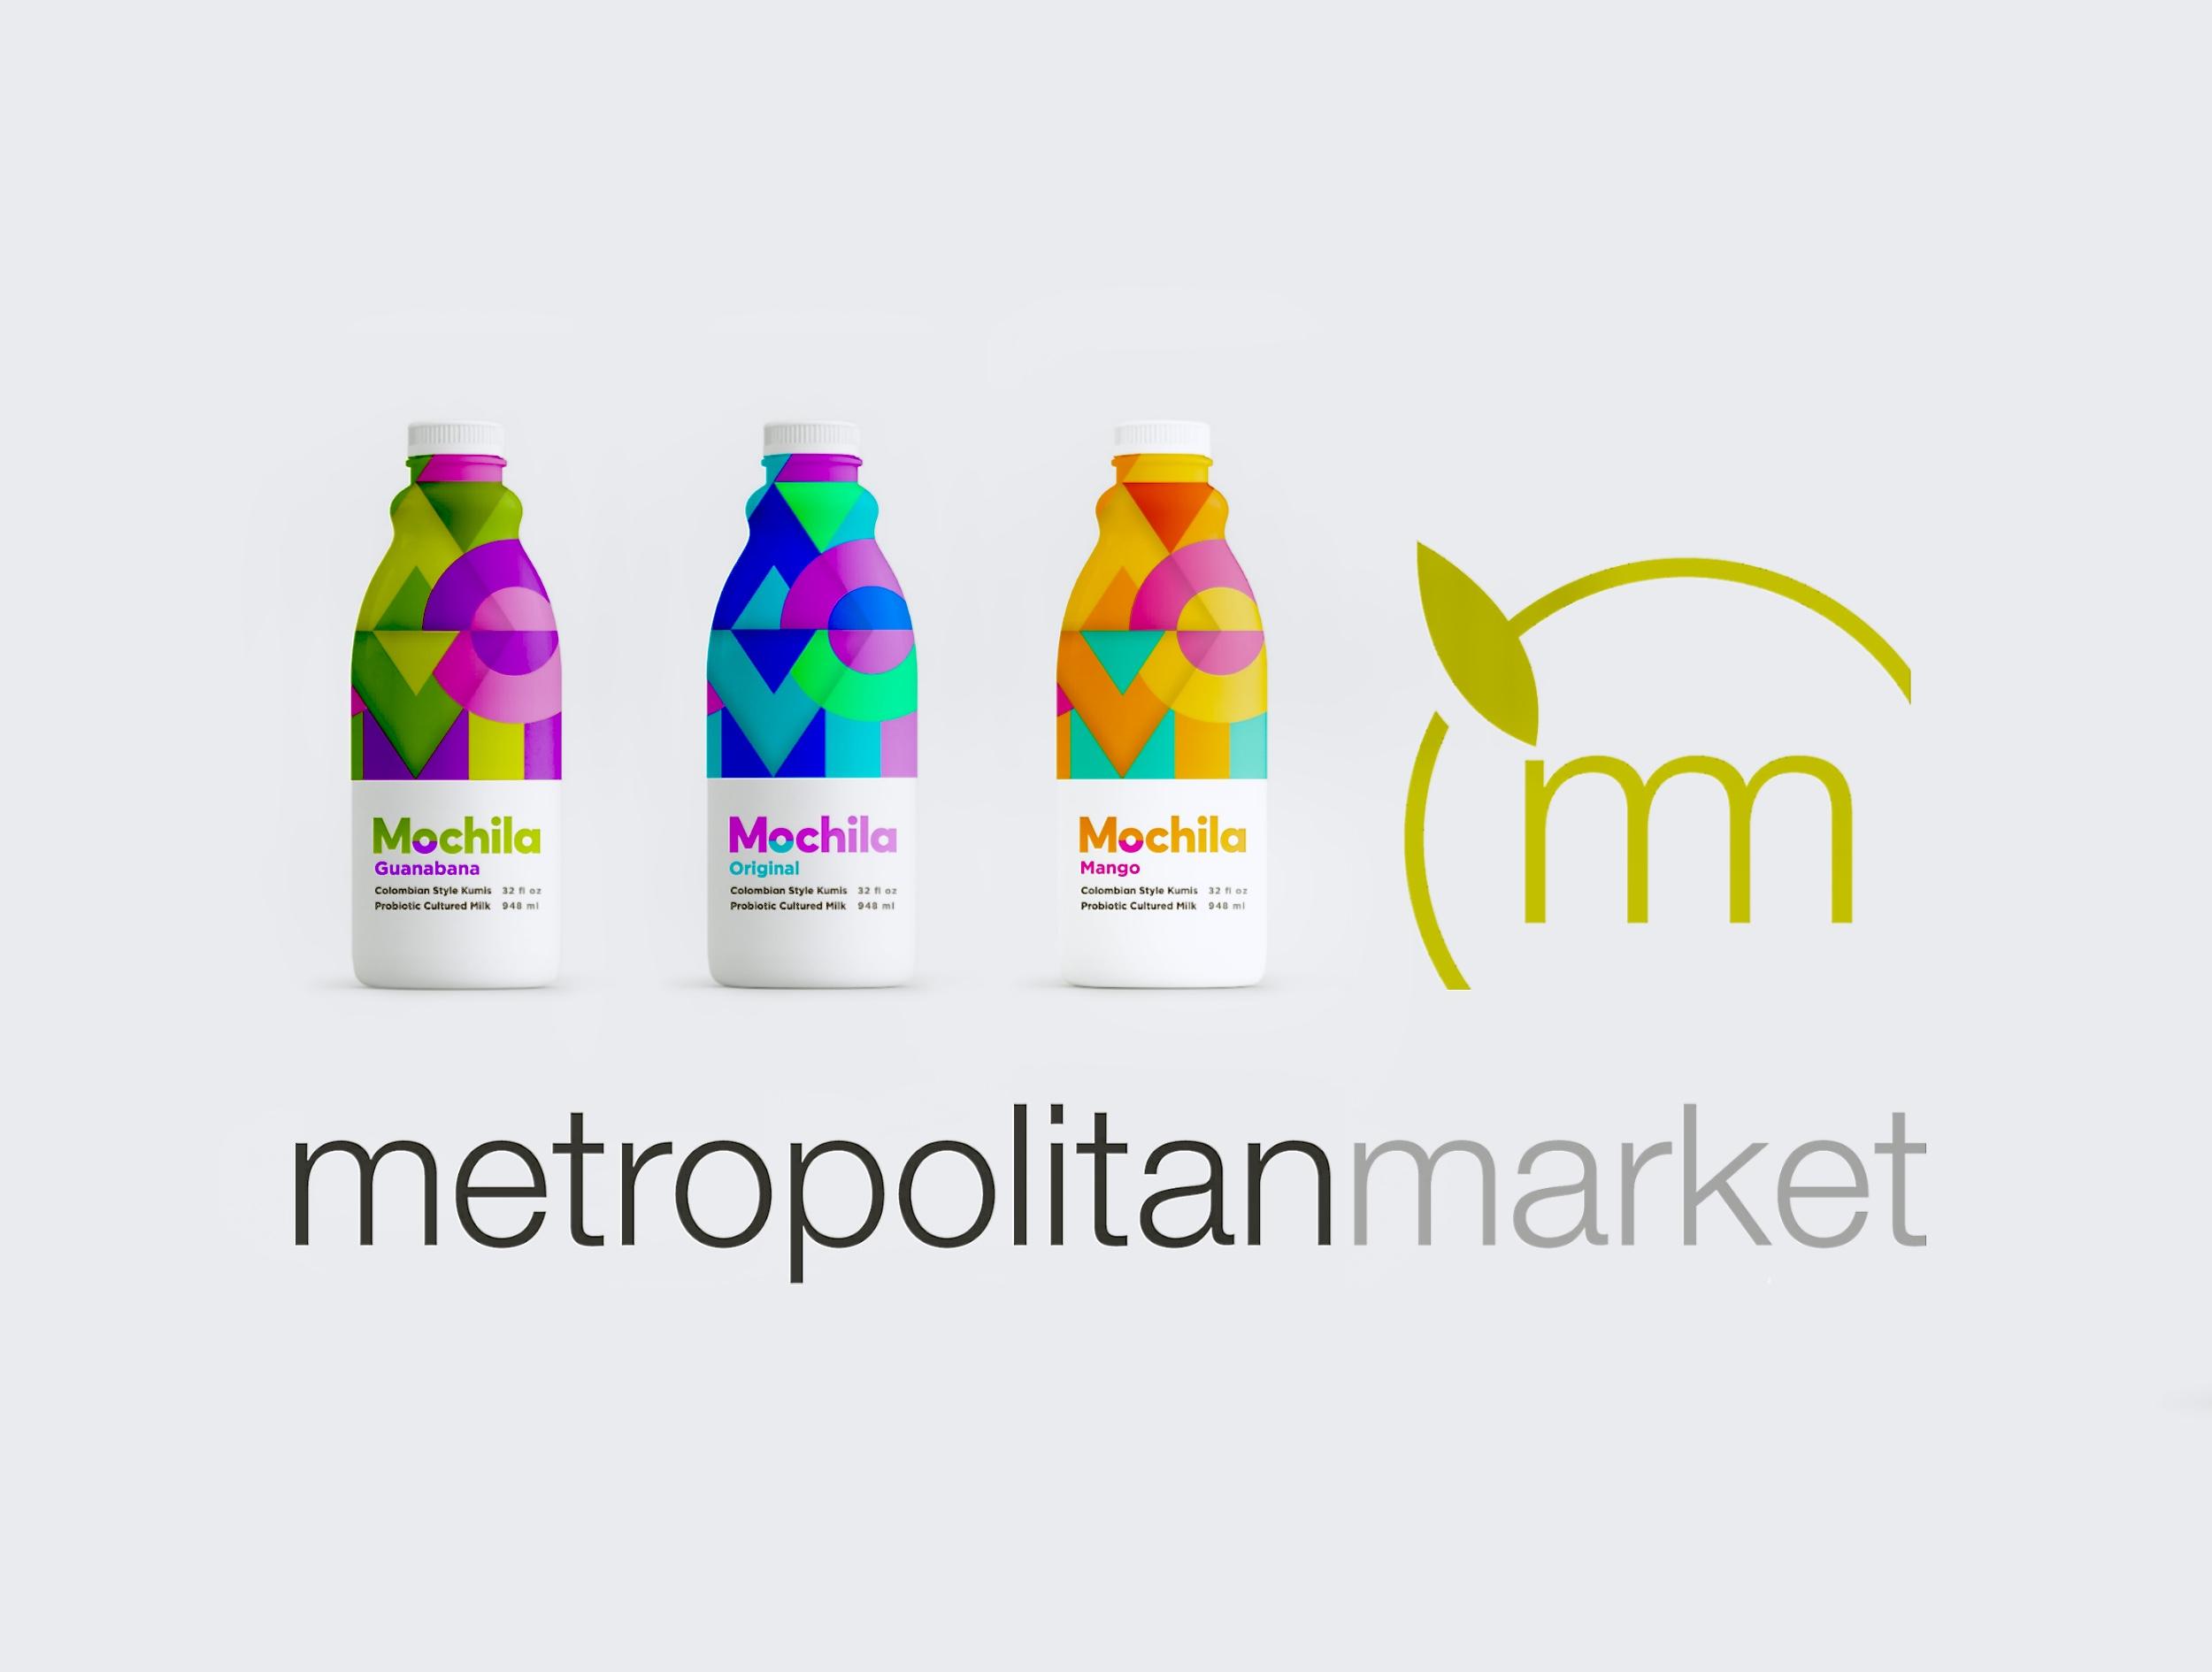 Mochila Metropolitan Market